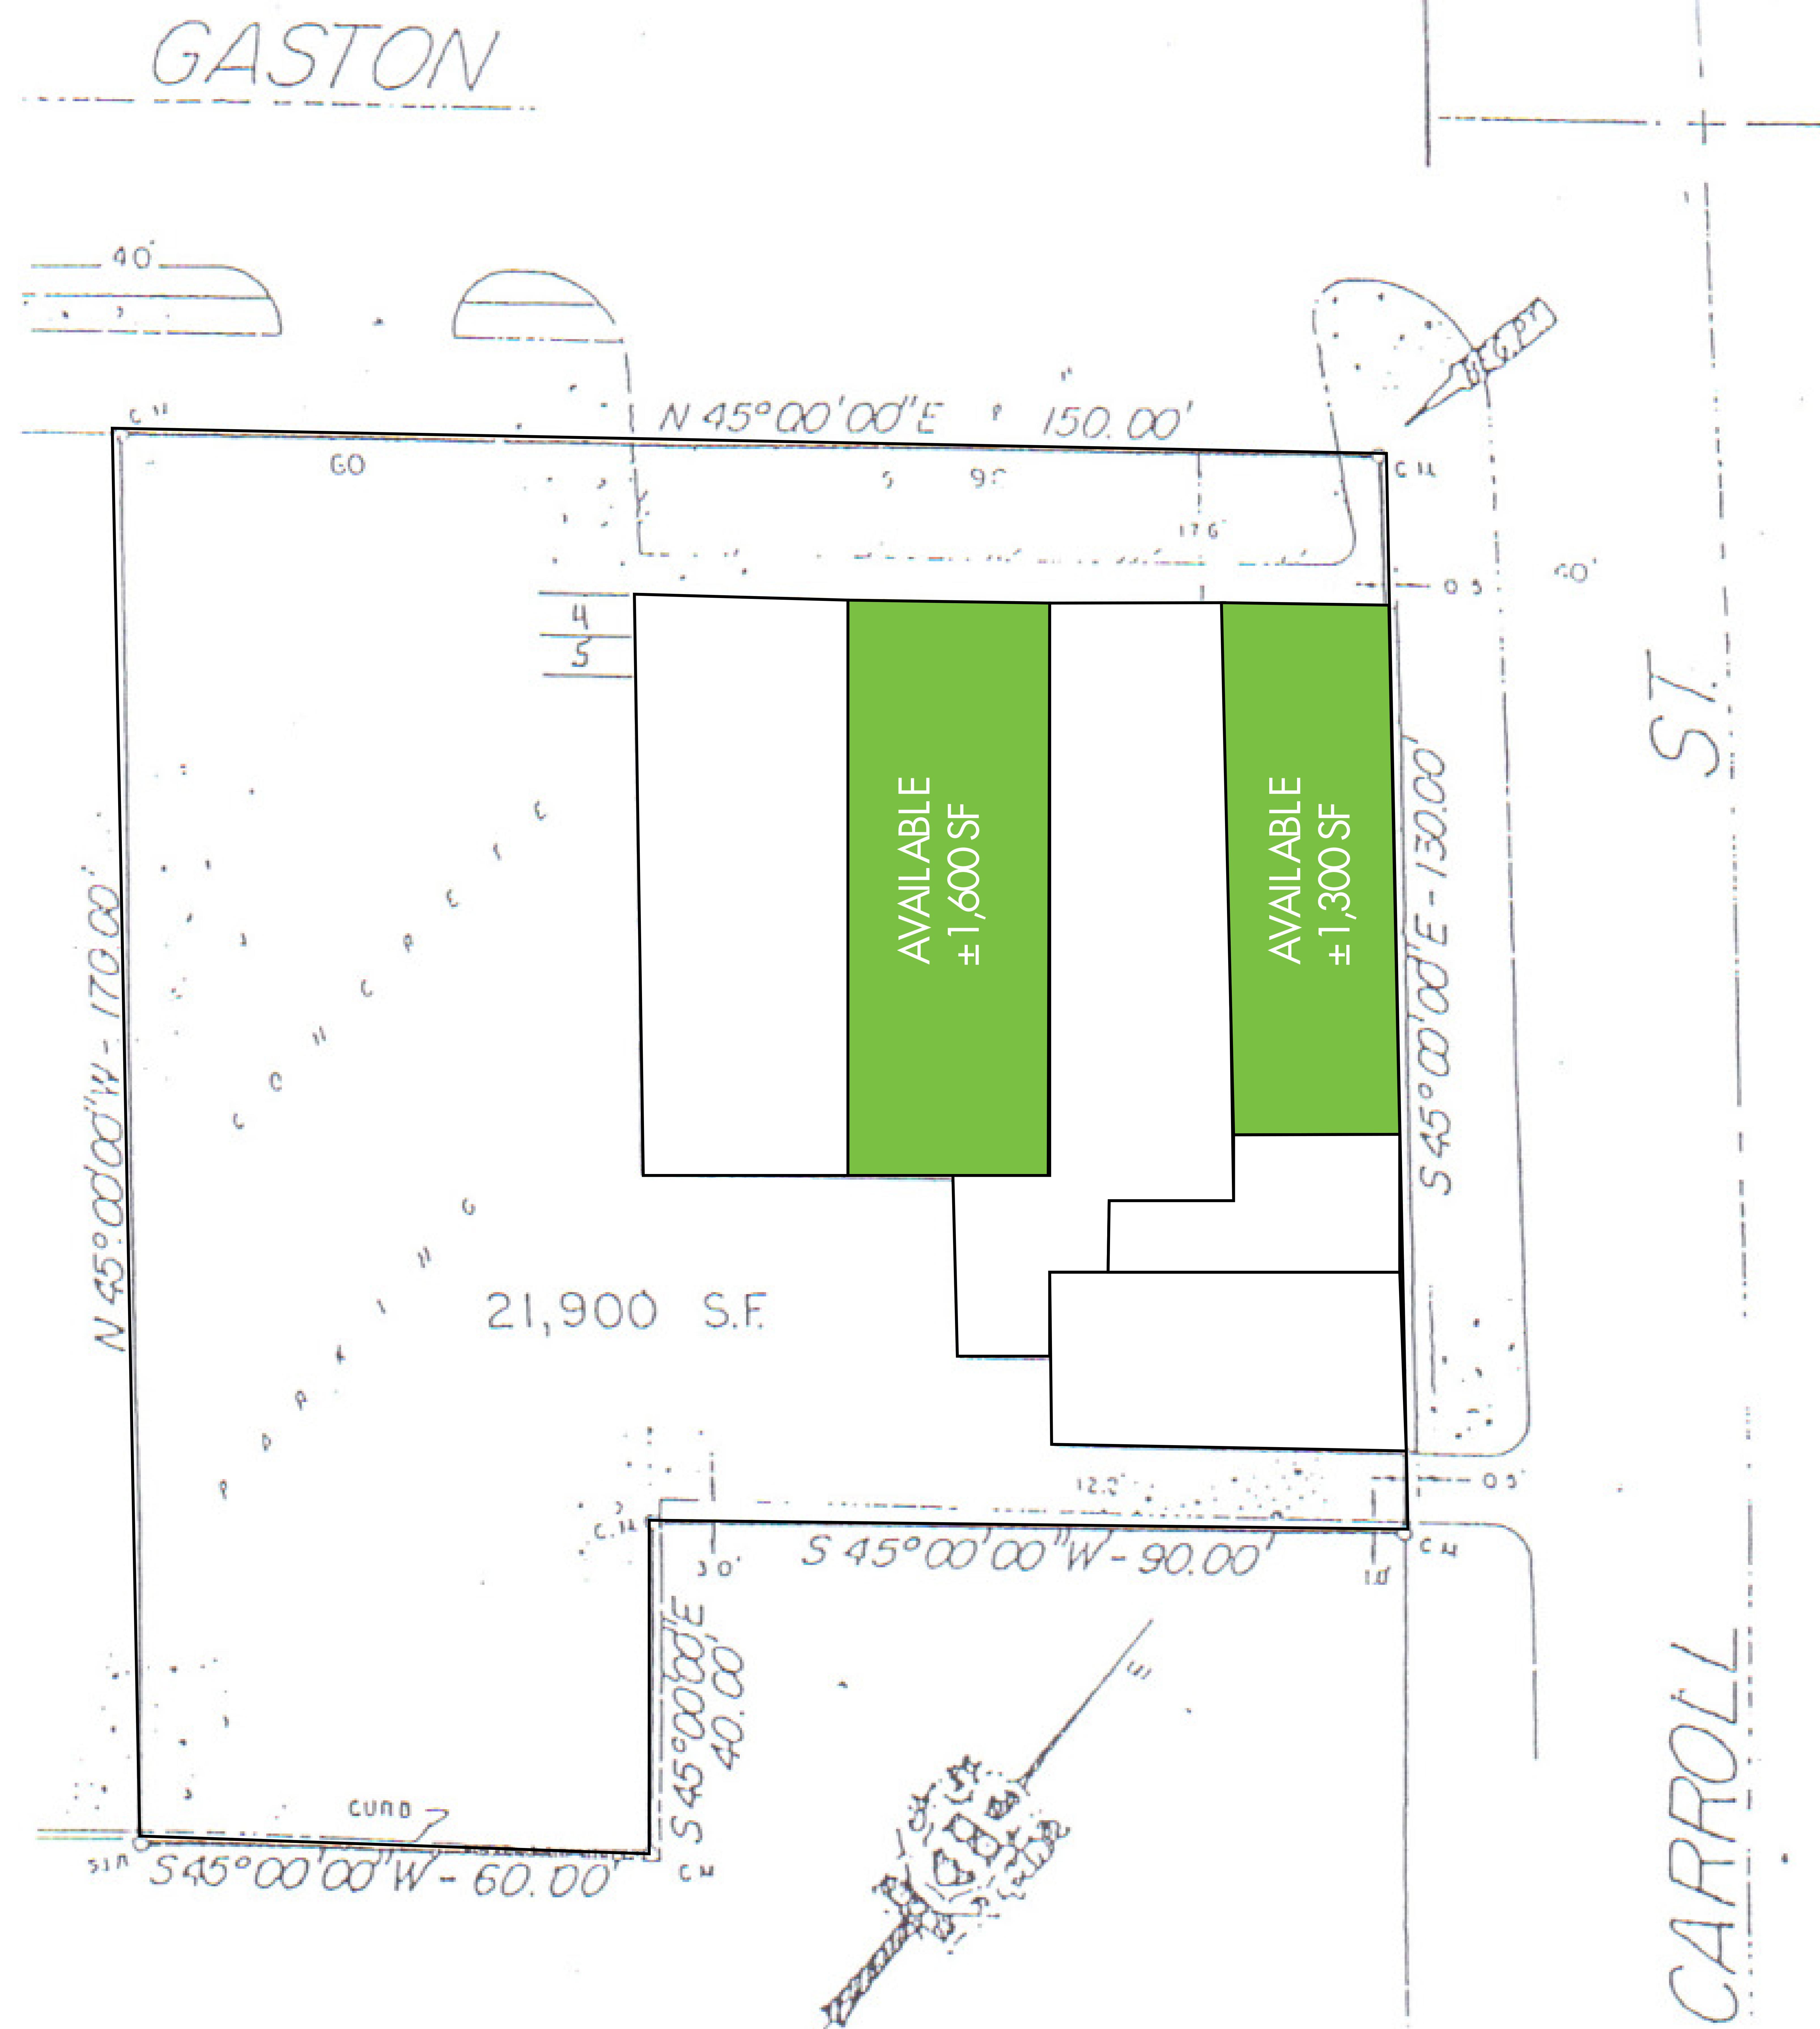 Gaston Retail Center: site plan